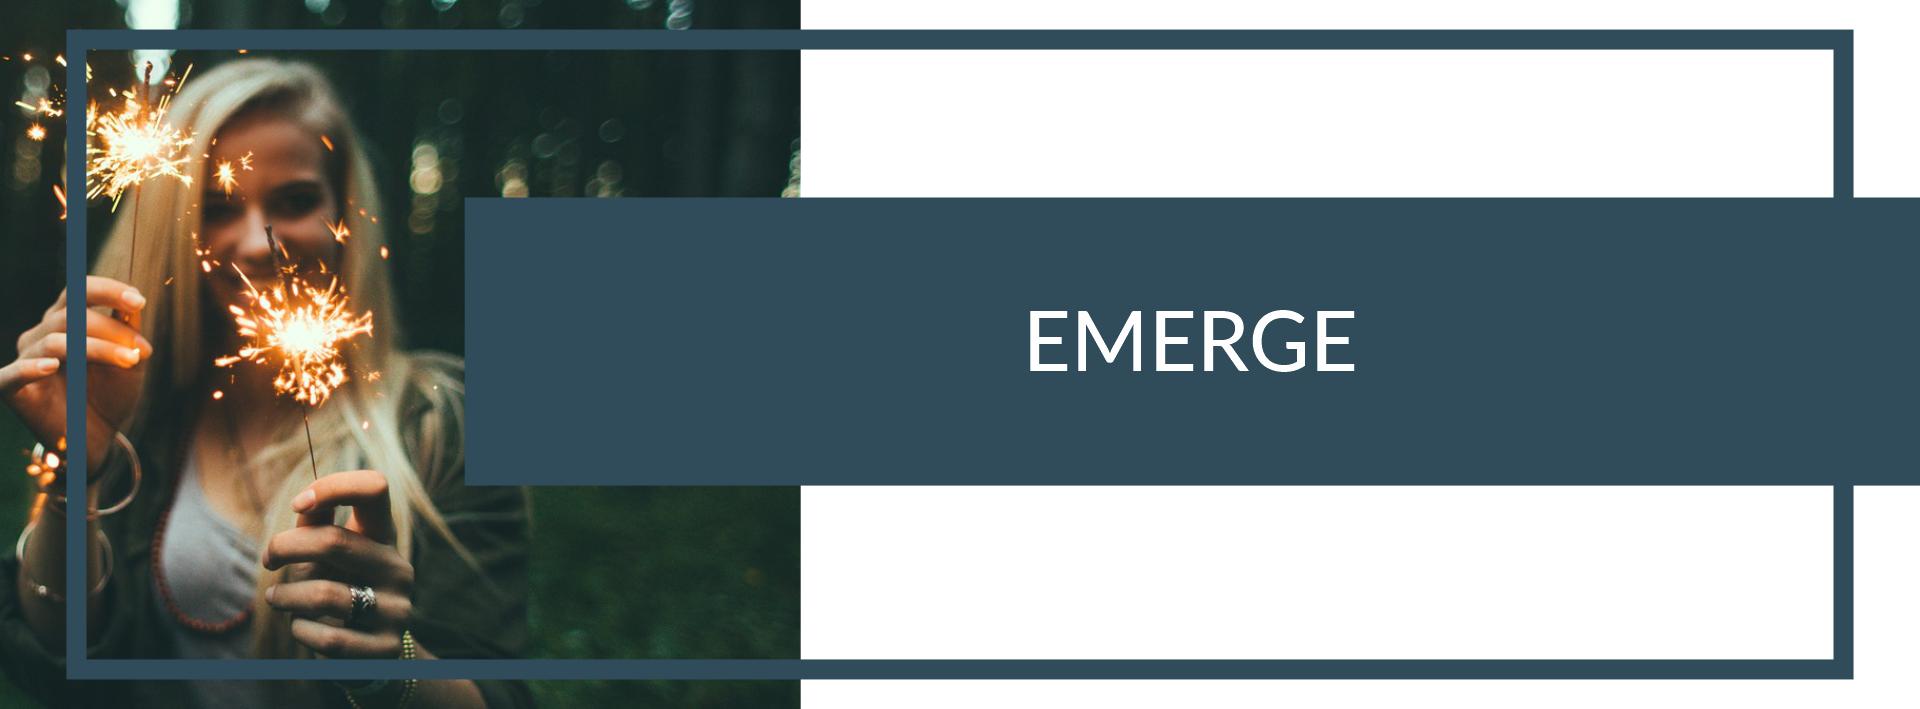 The Emerge Personal Mastery Program